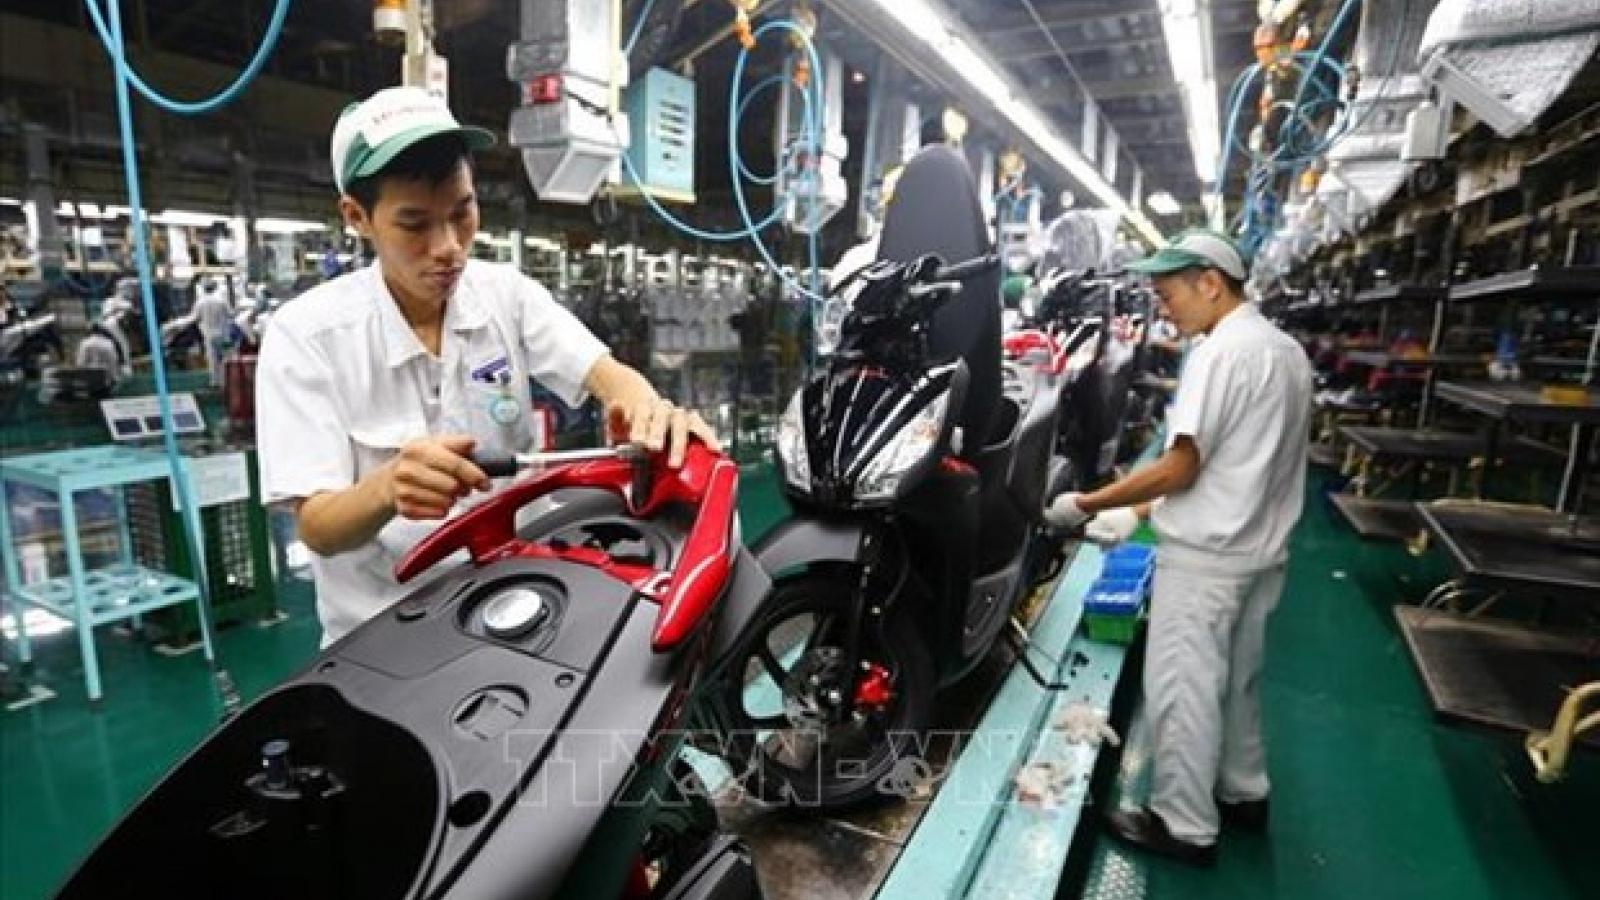 Motorbike sales slash nearly 46% in Q3